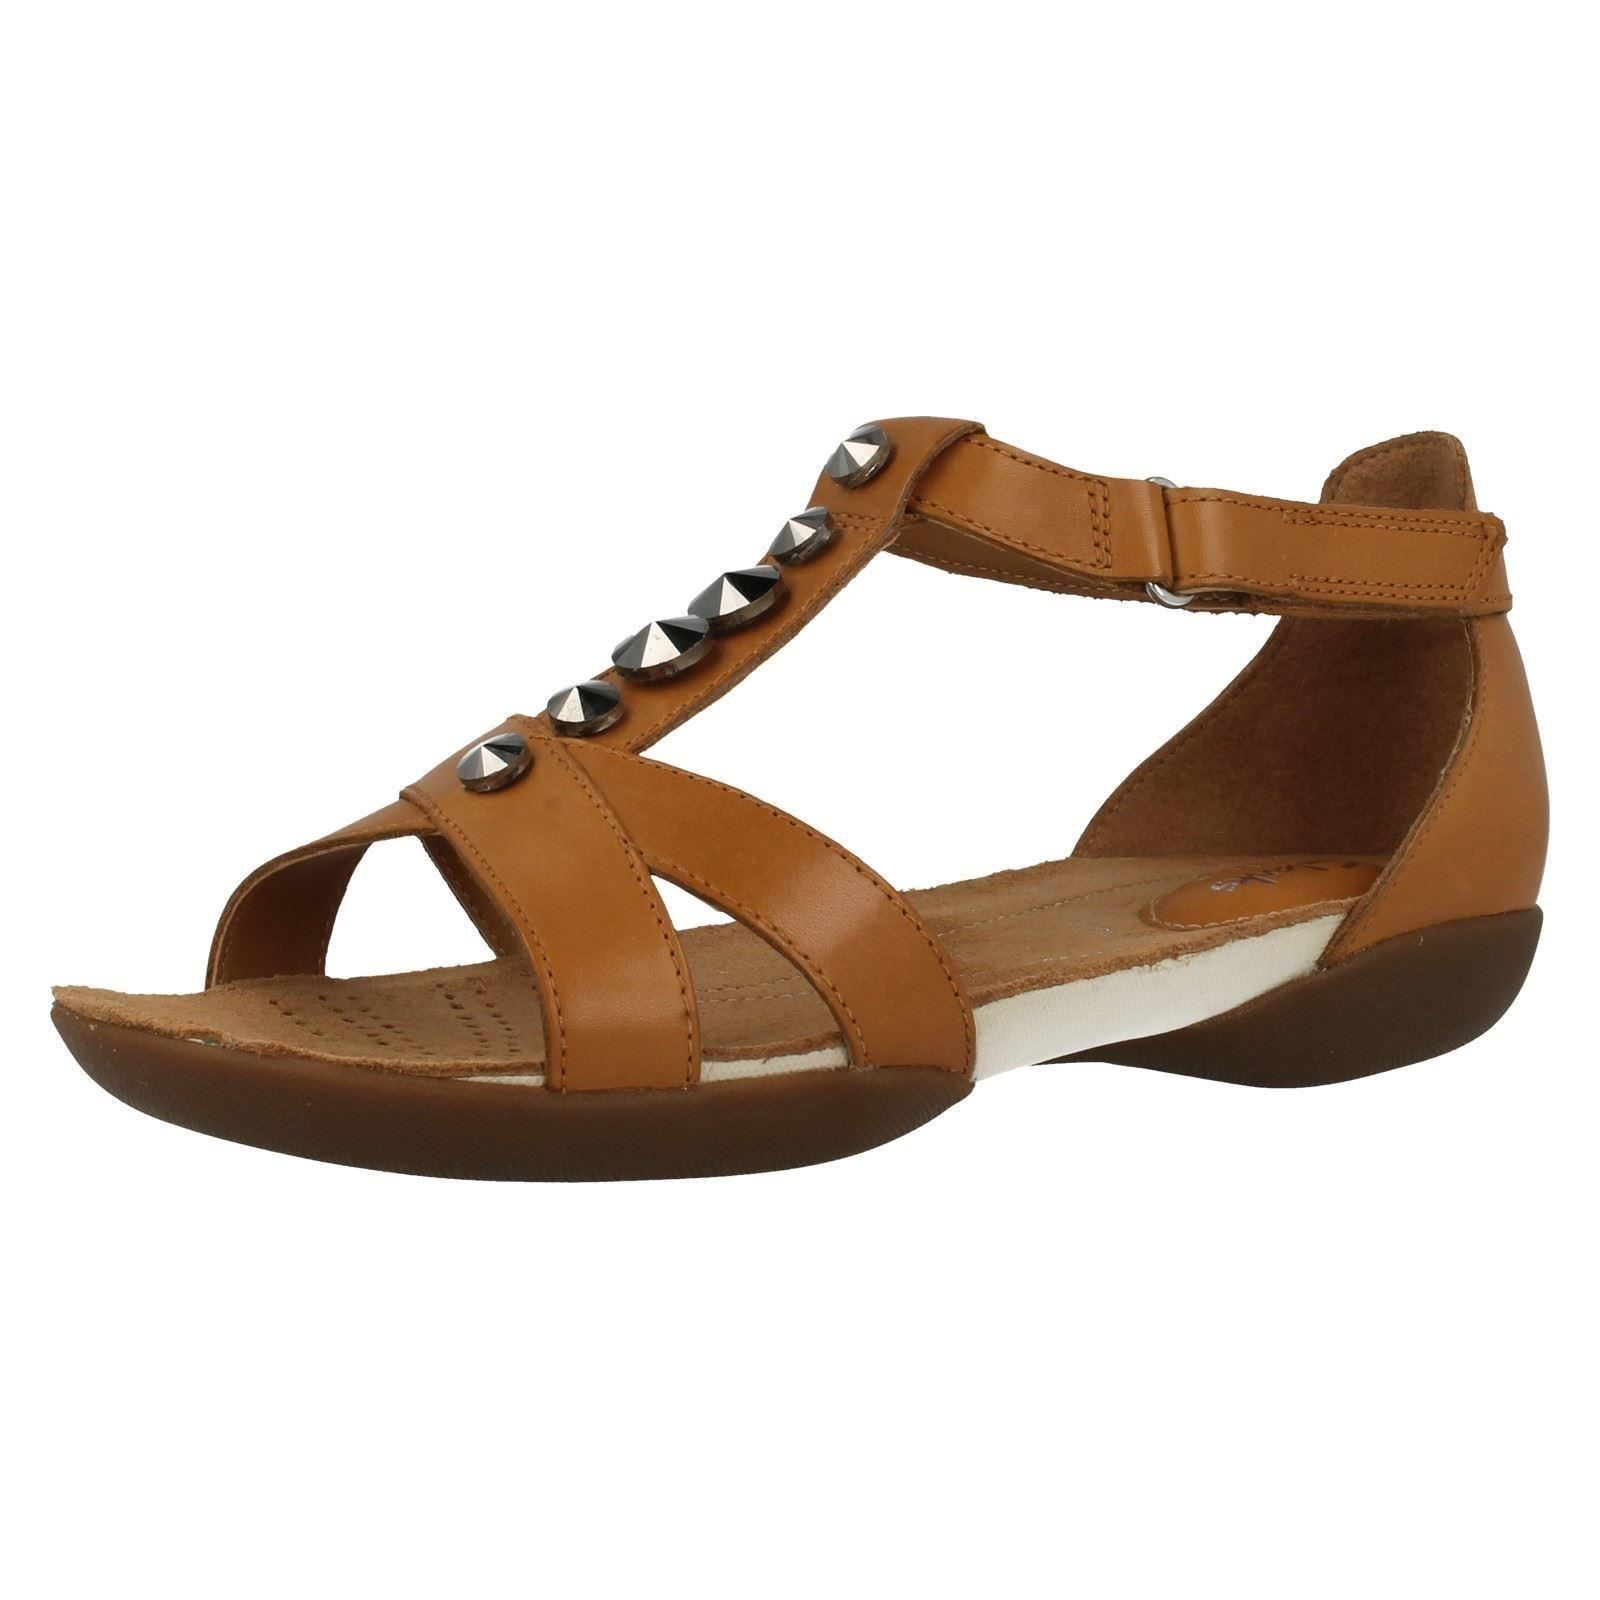 Aerosole Sandals: Clarks Sandals Raffi Scent